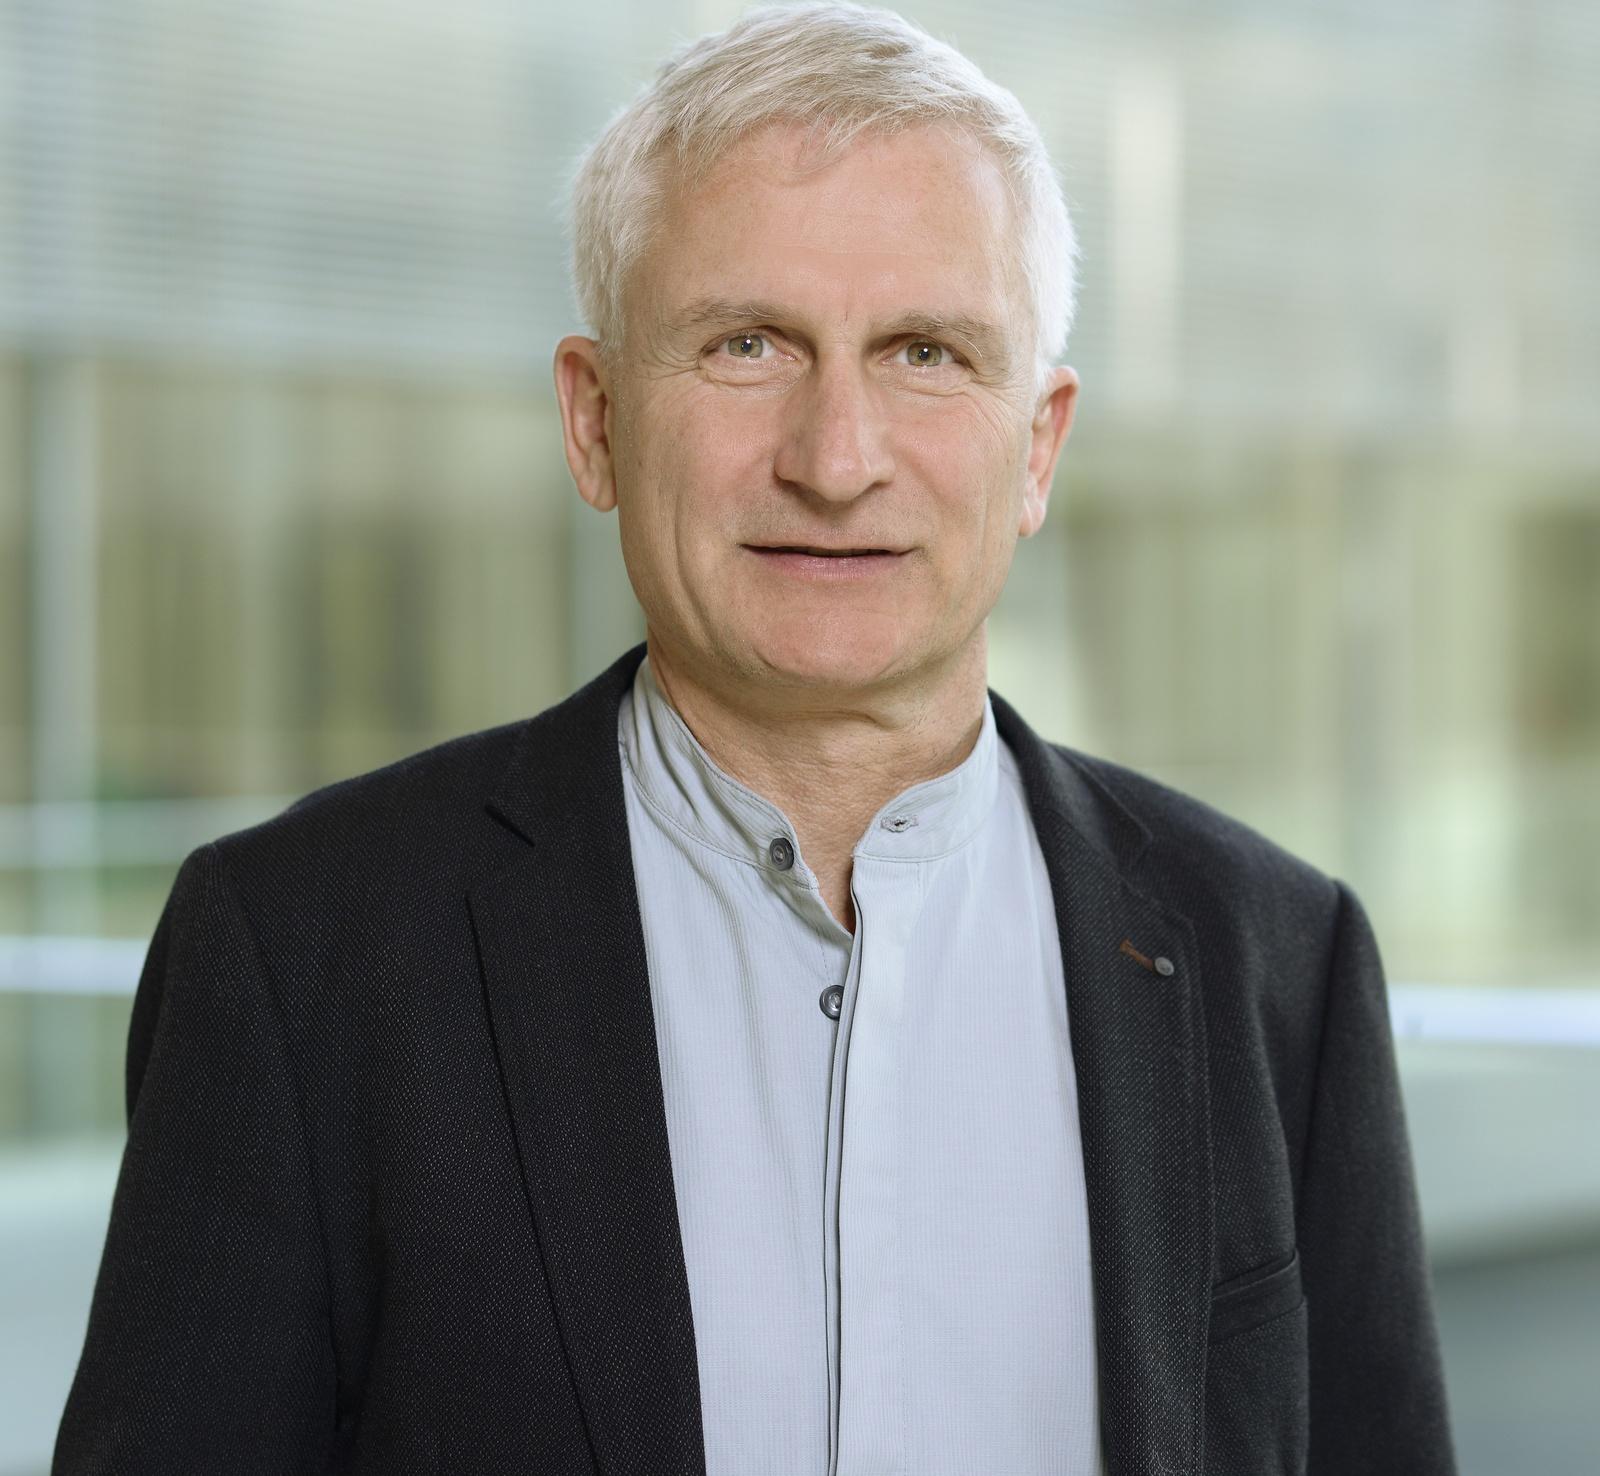 Gerhard Zickenheiner MdB